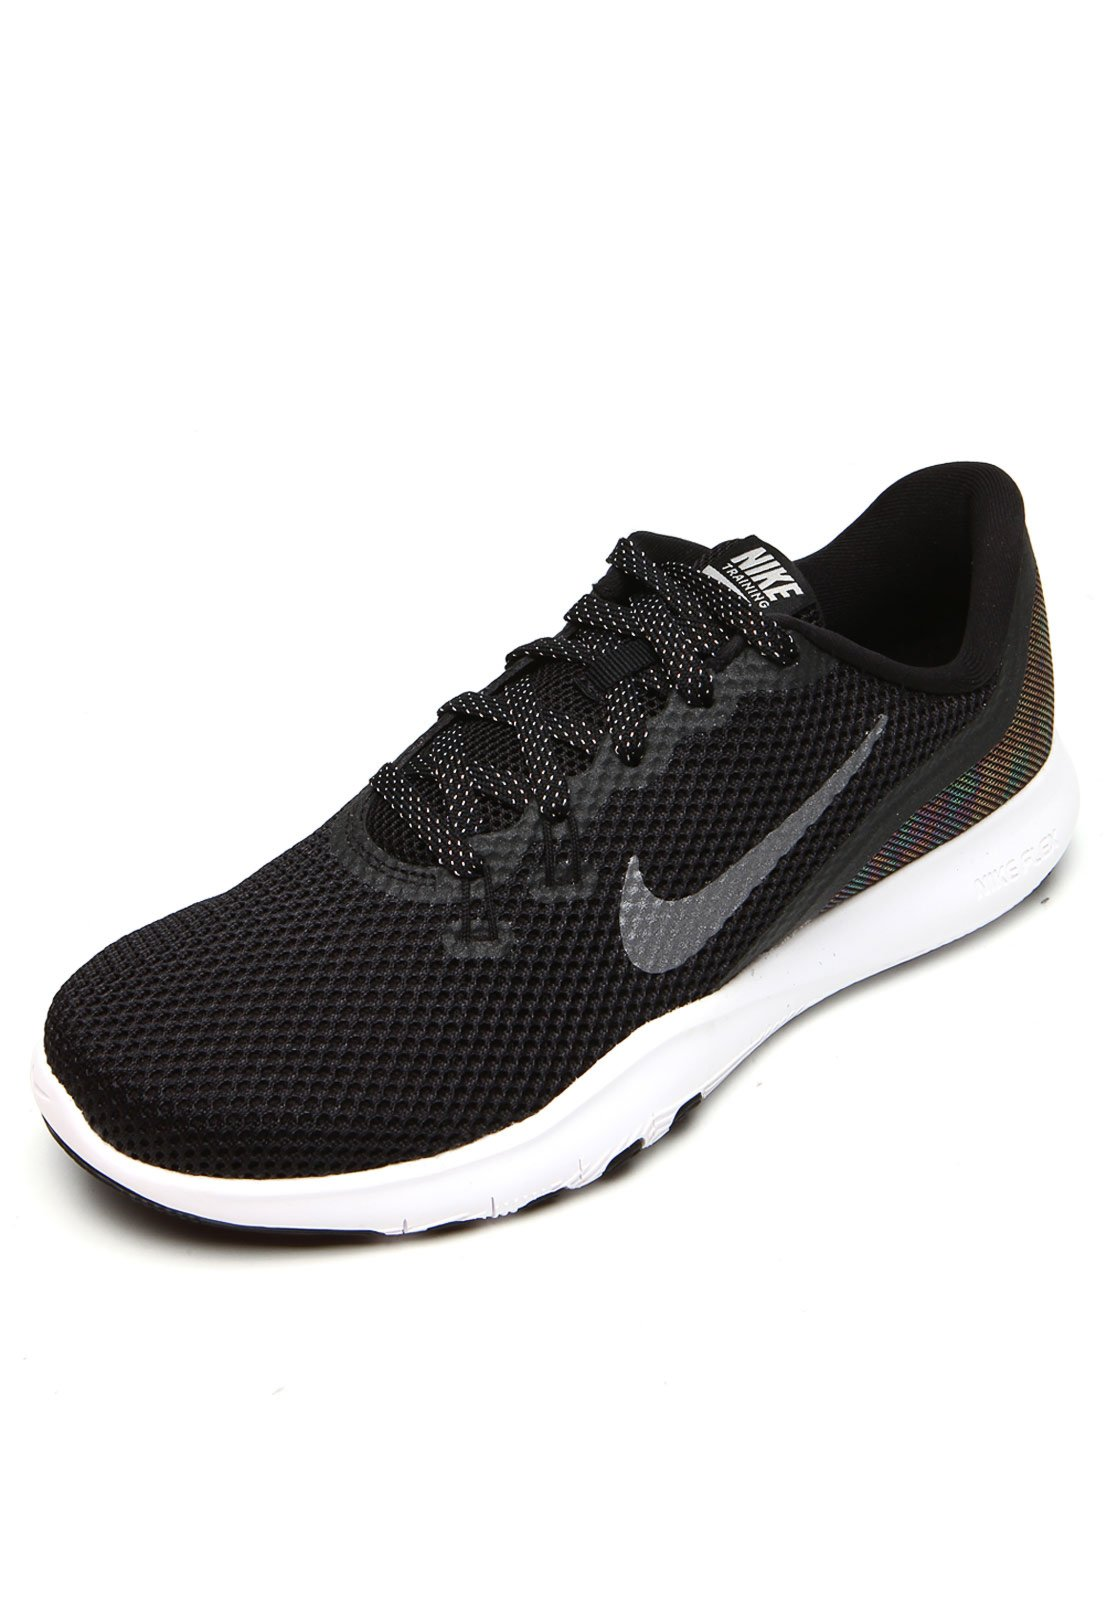 Nike Flex Trainer 7 Metallic Preto